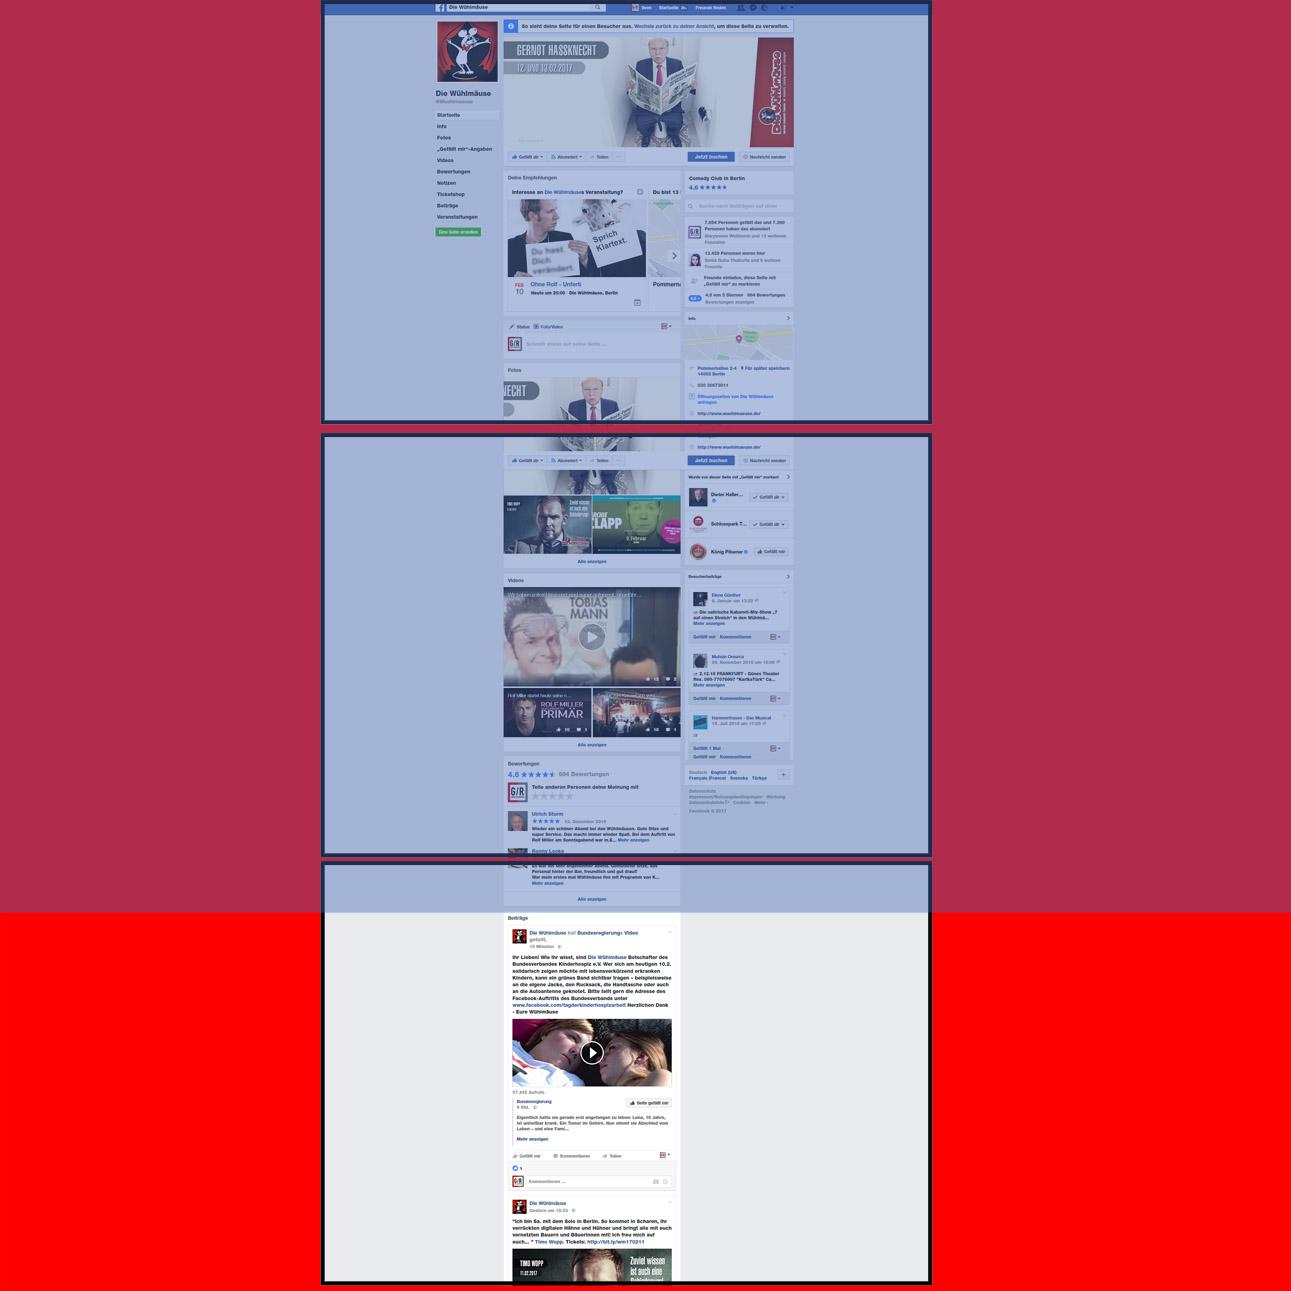 Facebook: Scrolling, scrolling, scrolling